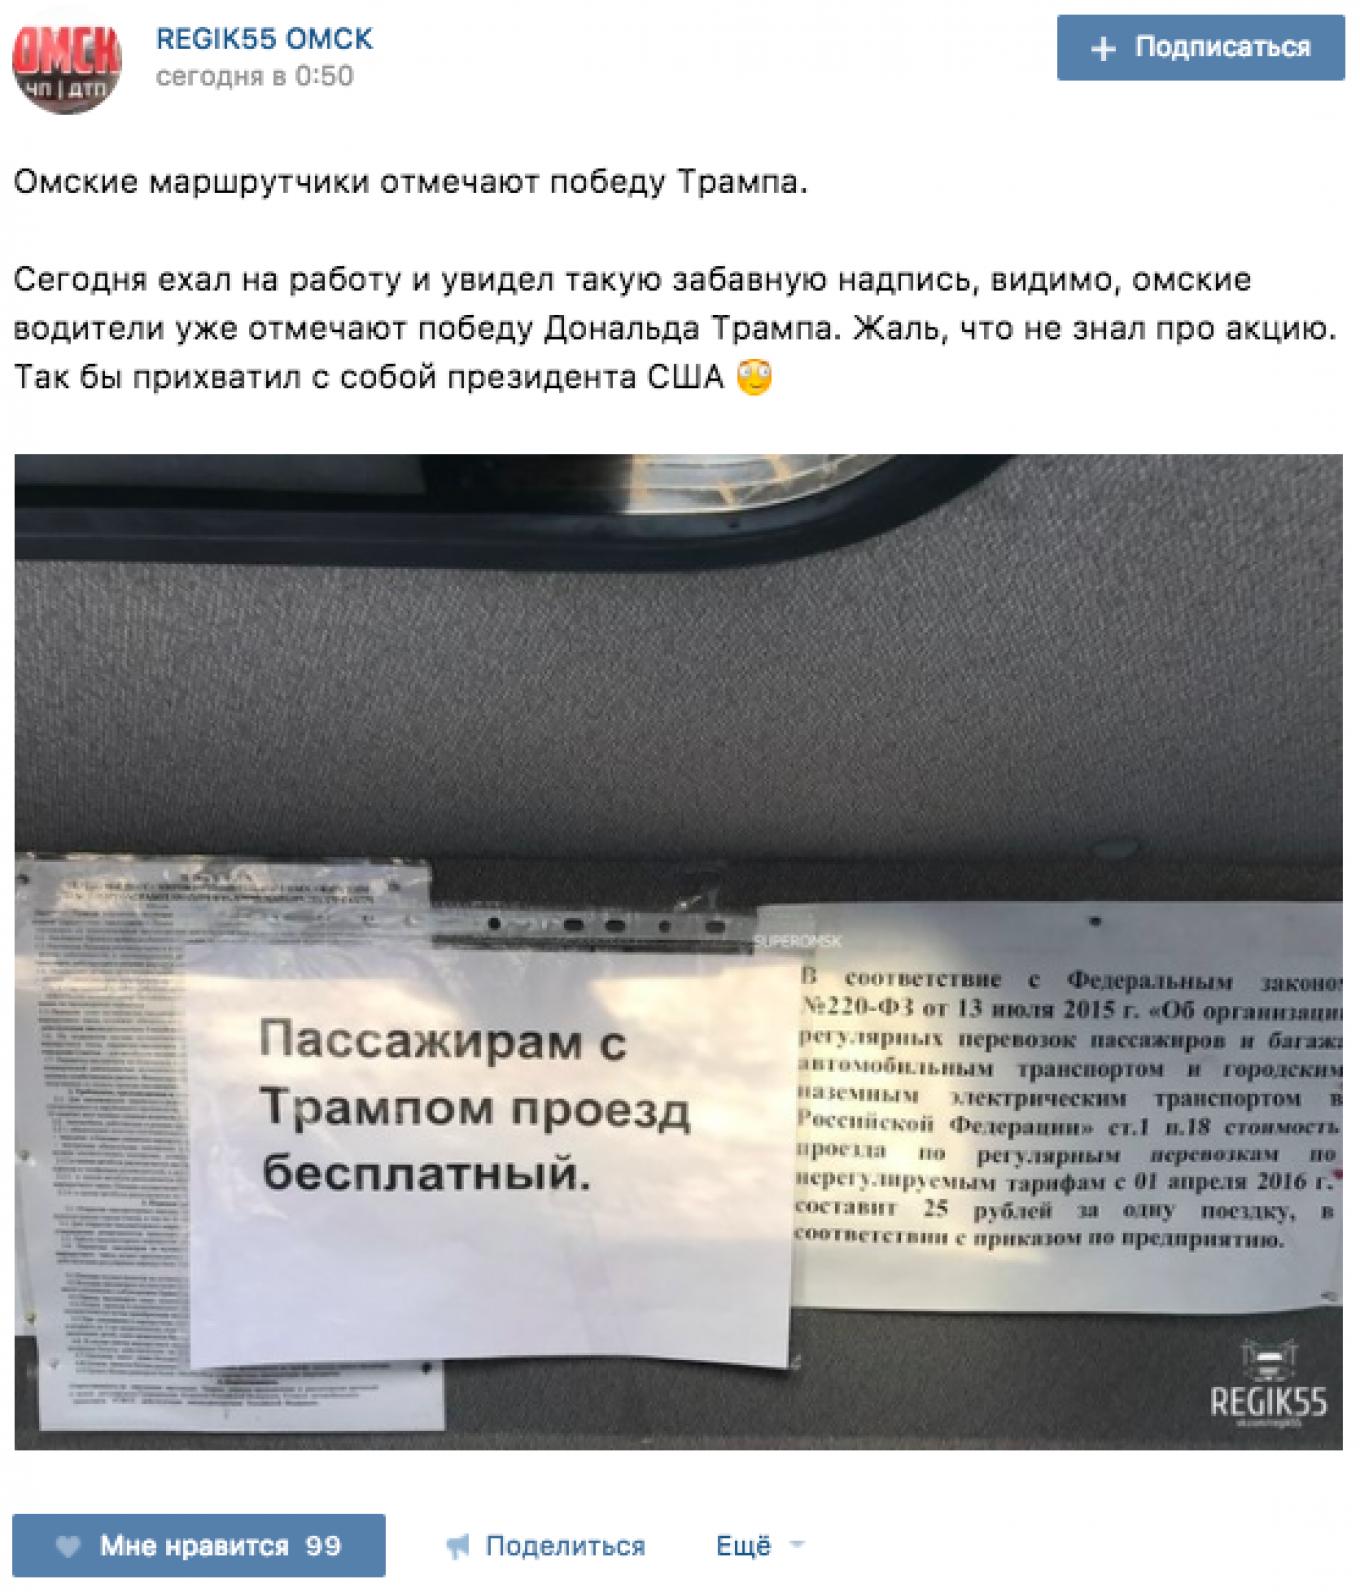 "Sign reads, ""Passengers with Trump ride free."" REGIK55 OMSK / Vkontakte"